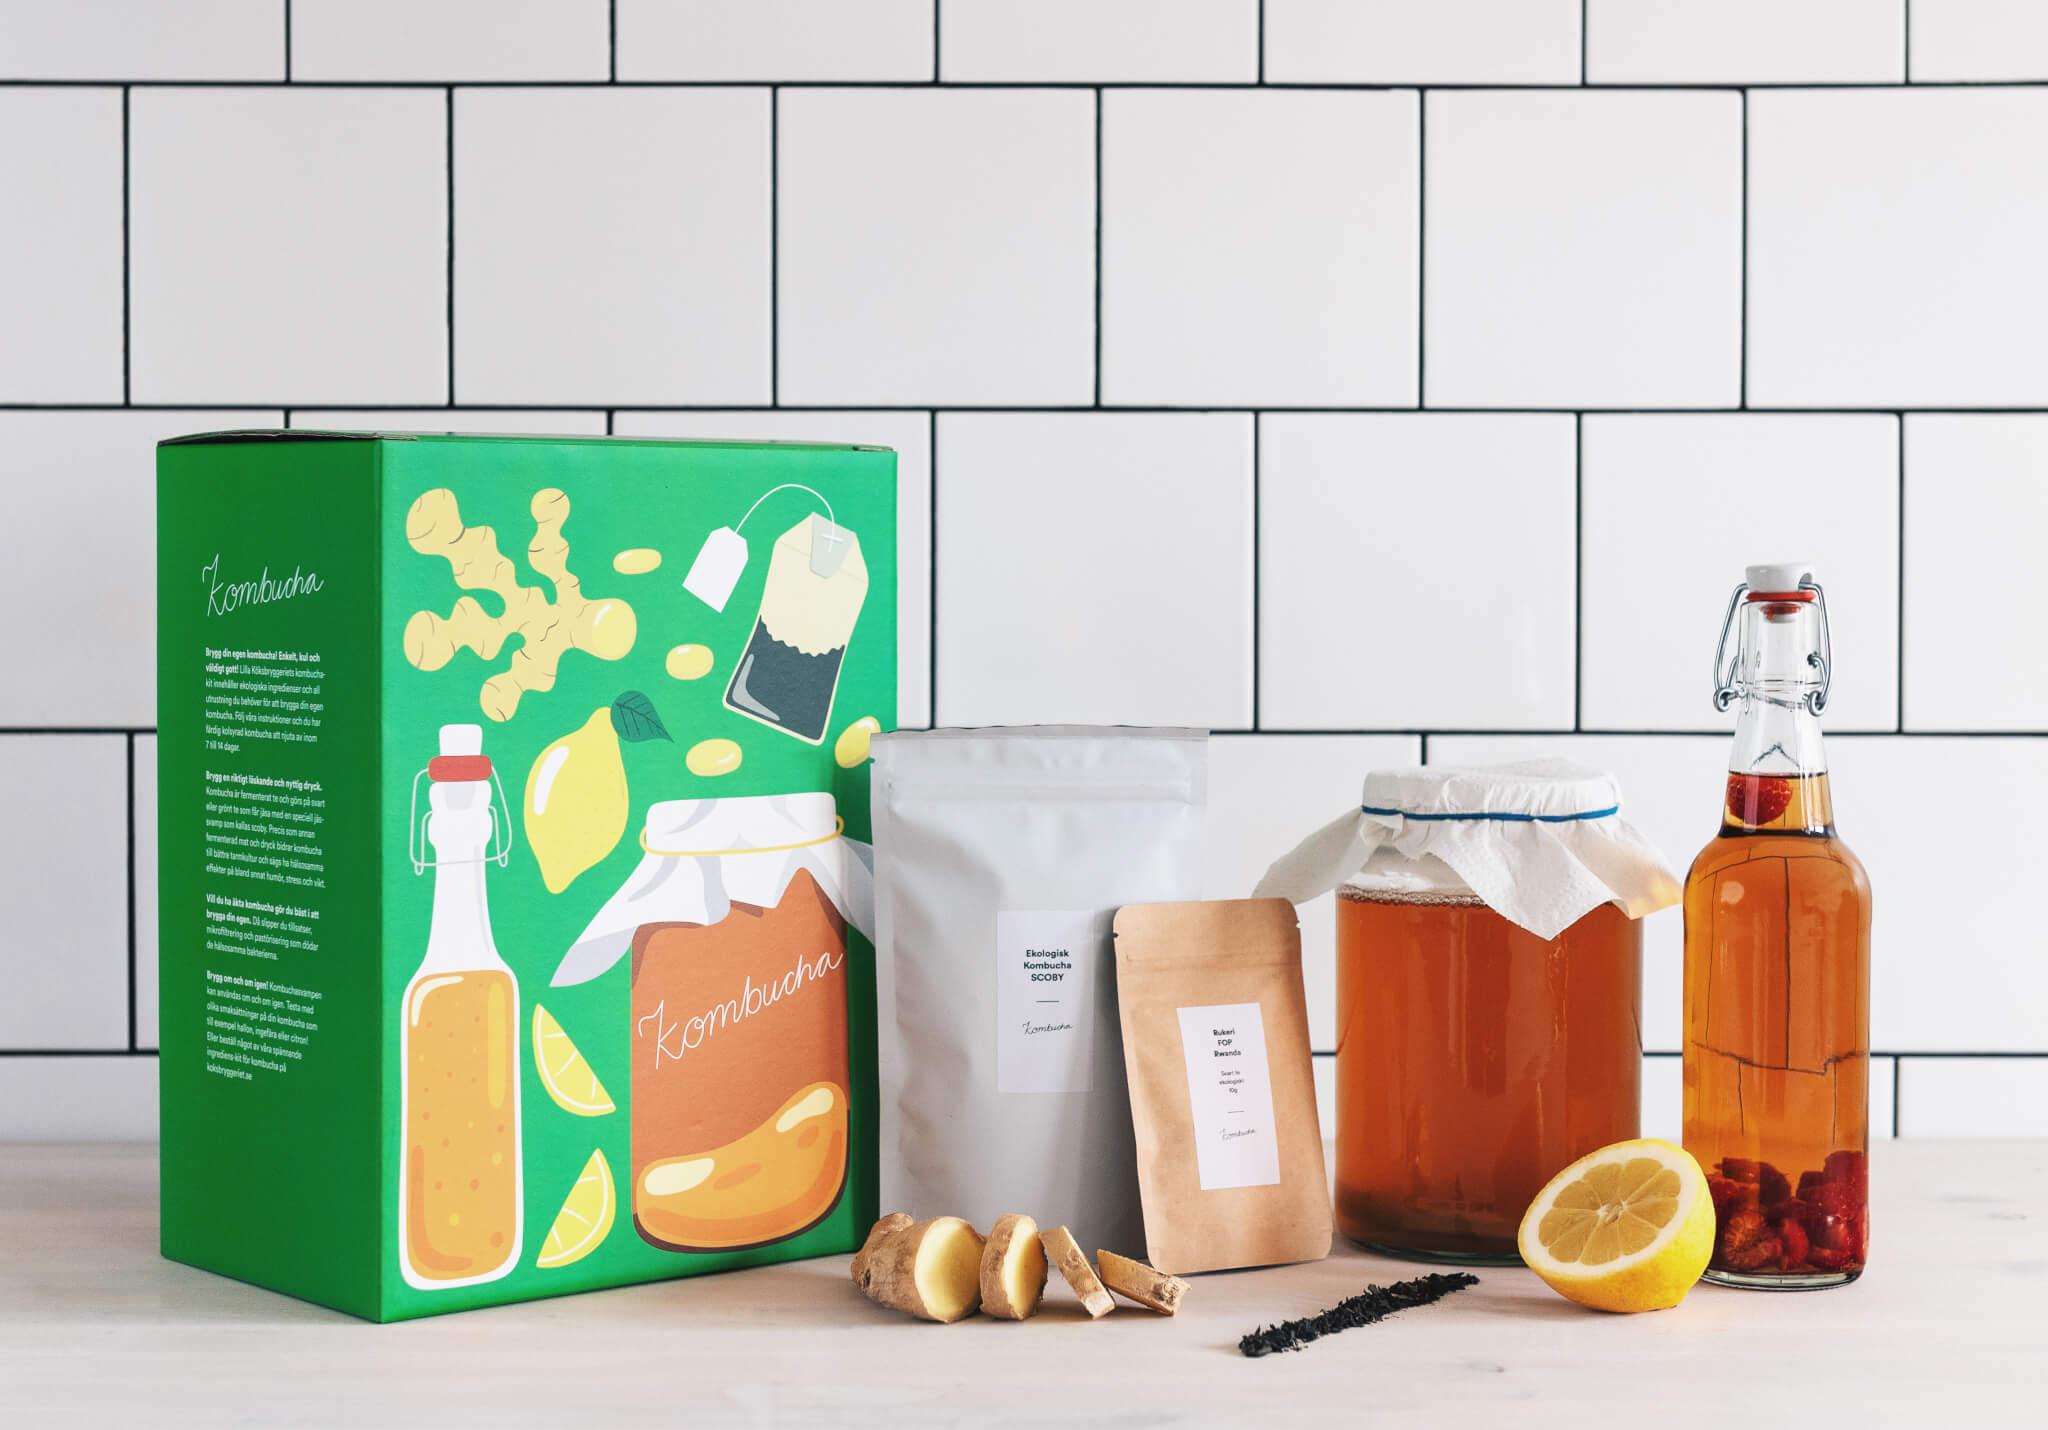 Imballaggio di Det Lilla Köksbryggeriet